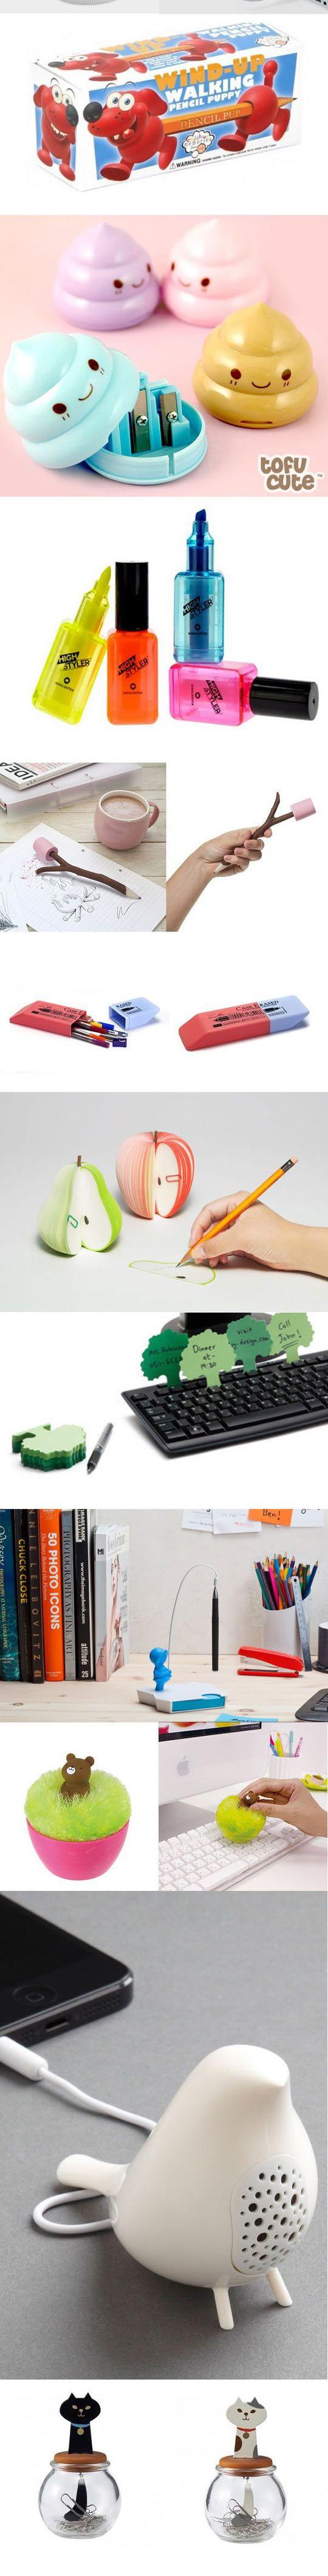 fun office supplies for desk. Coolest Desk Accessories Ever. SuppliesOffice SuppliesCute Fun Office Supplies For